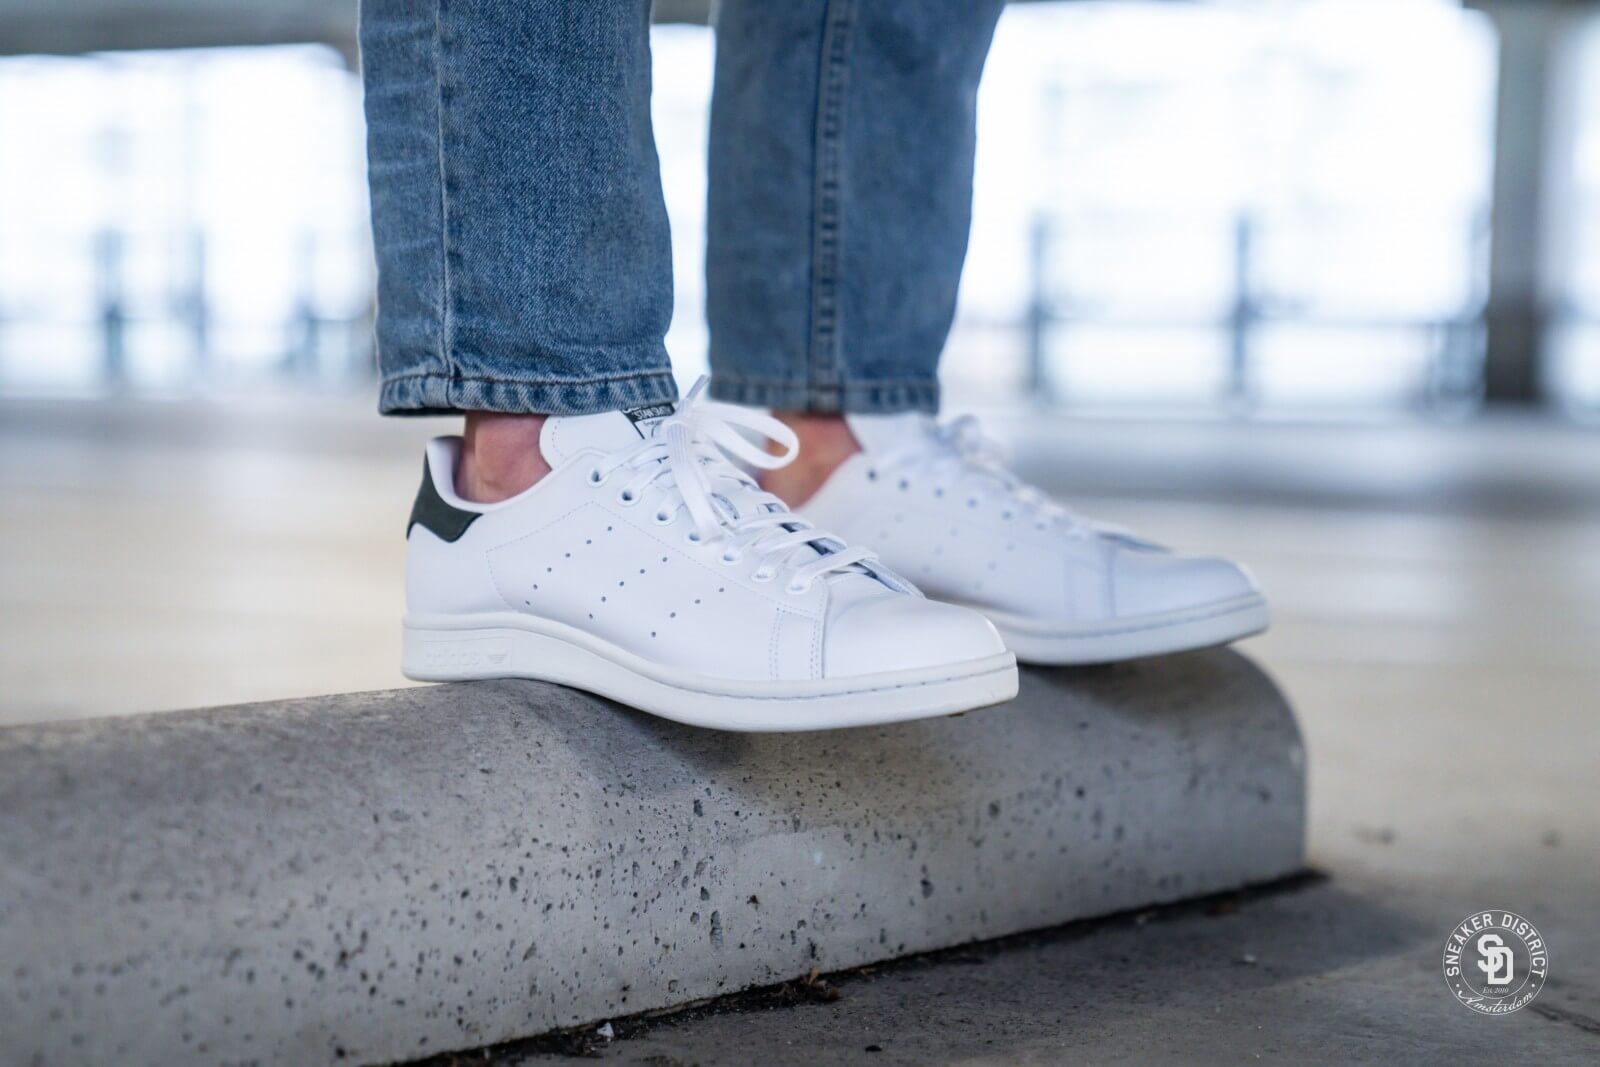 Adidas Stan Smith Footwear White/Legend